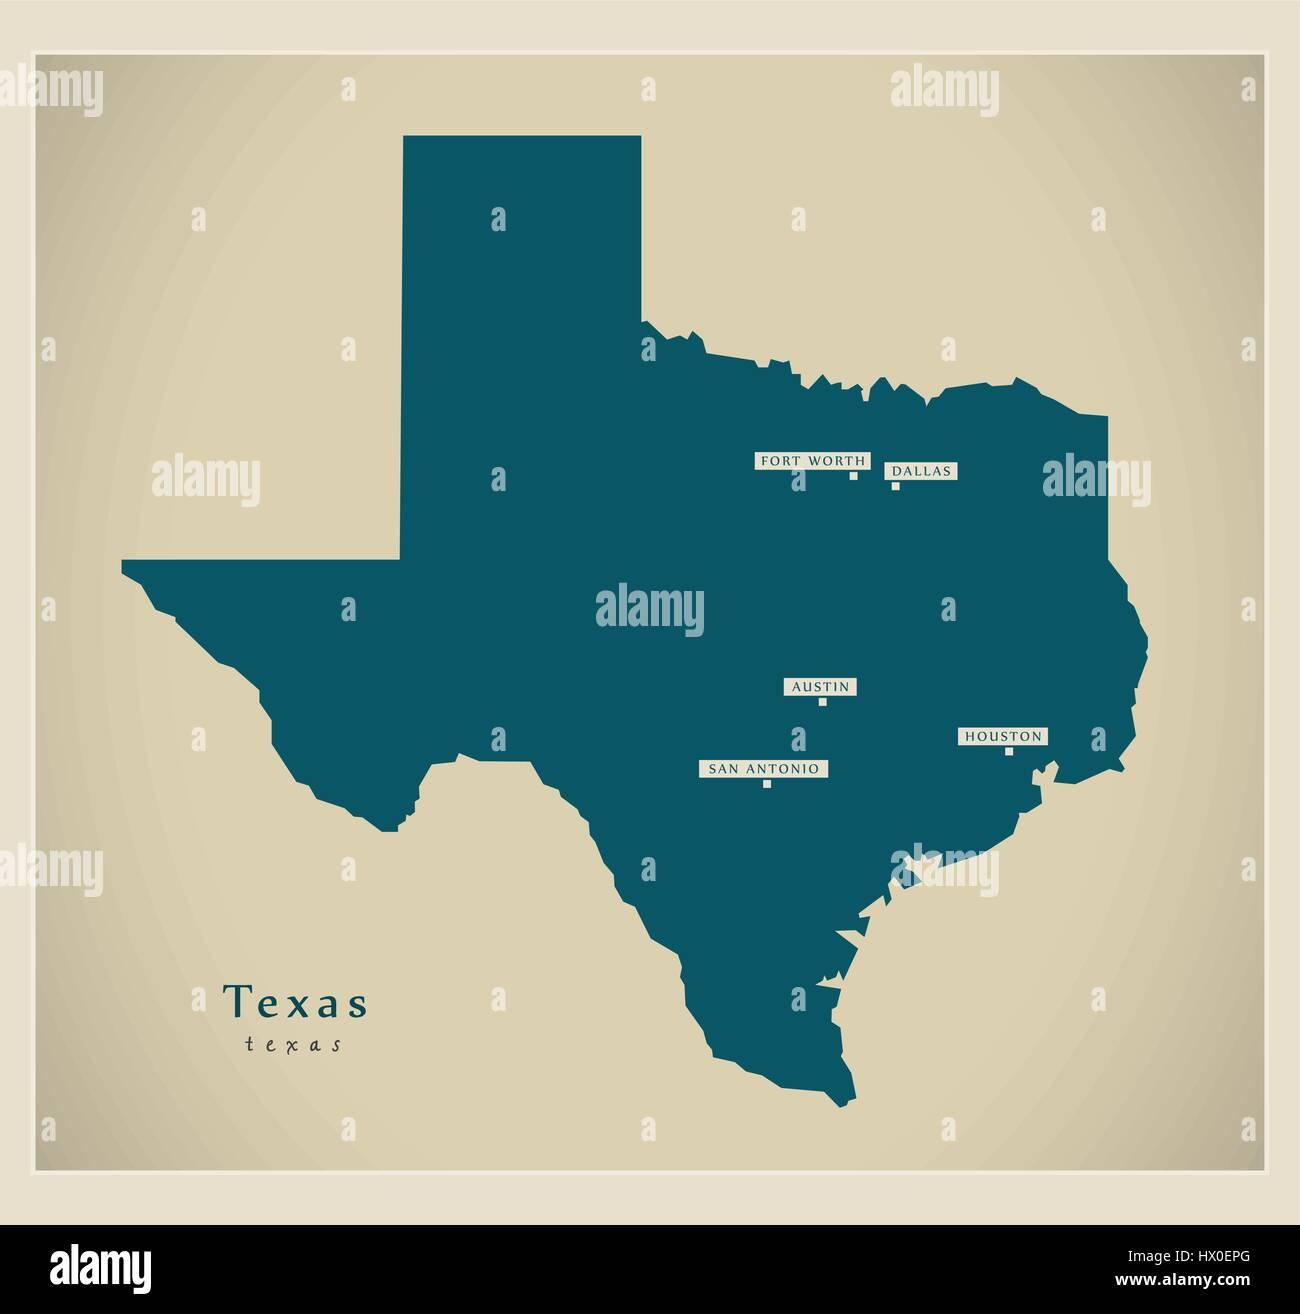 Map Of Texas Usa.Modern Map Texas Usa Stock Vector Art Illustration Vector Image